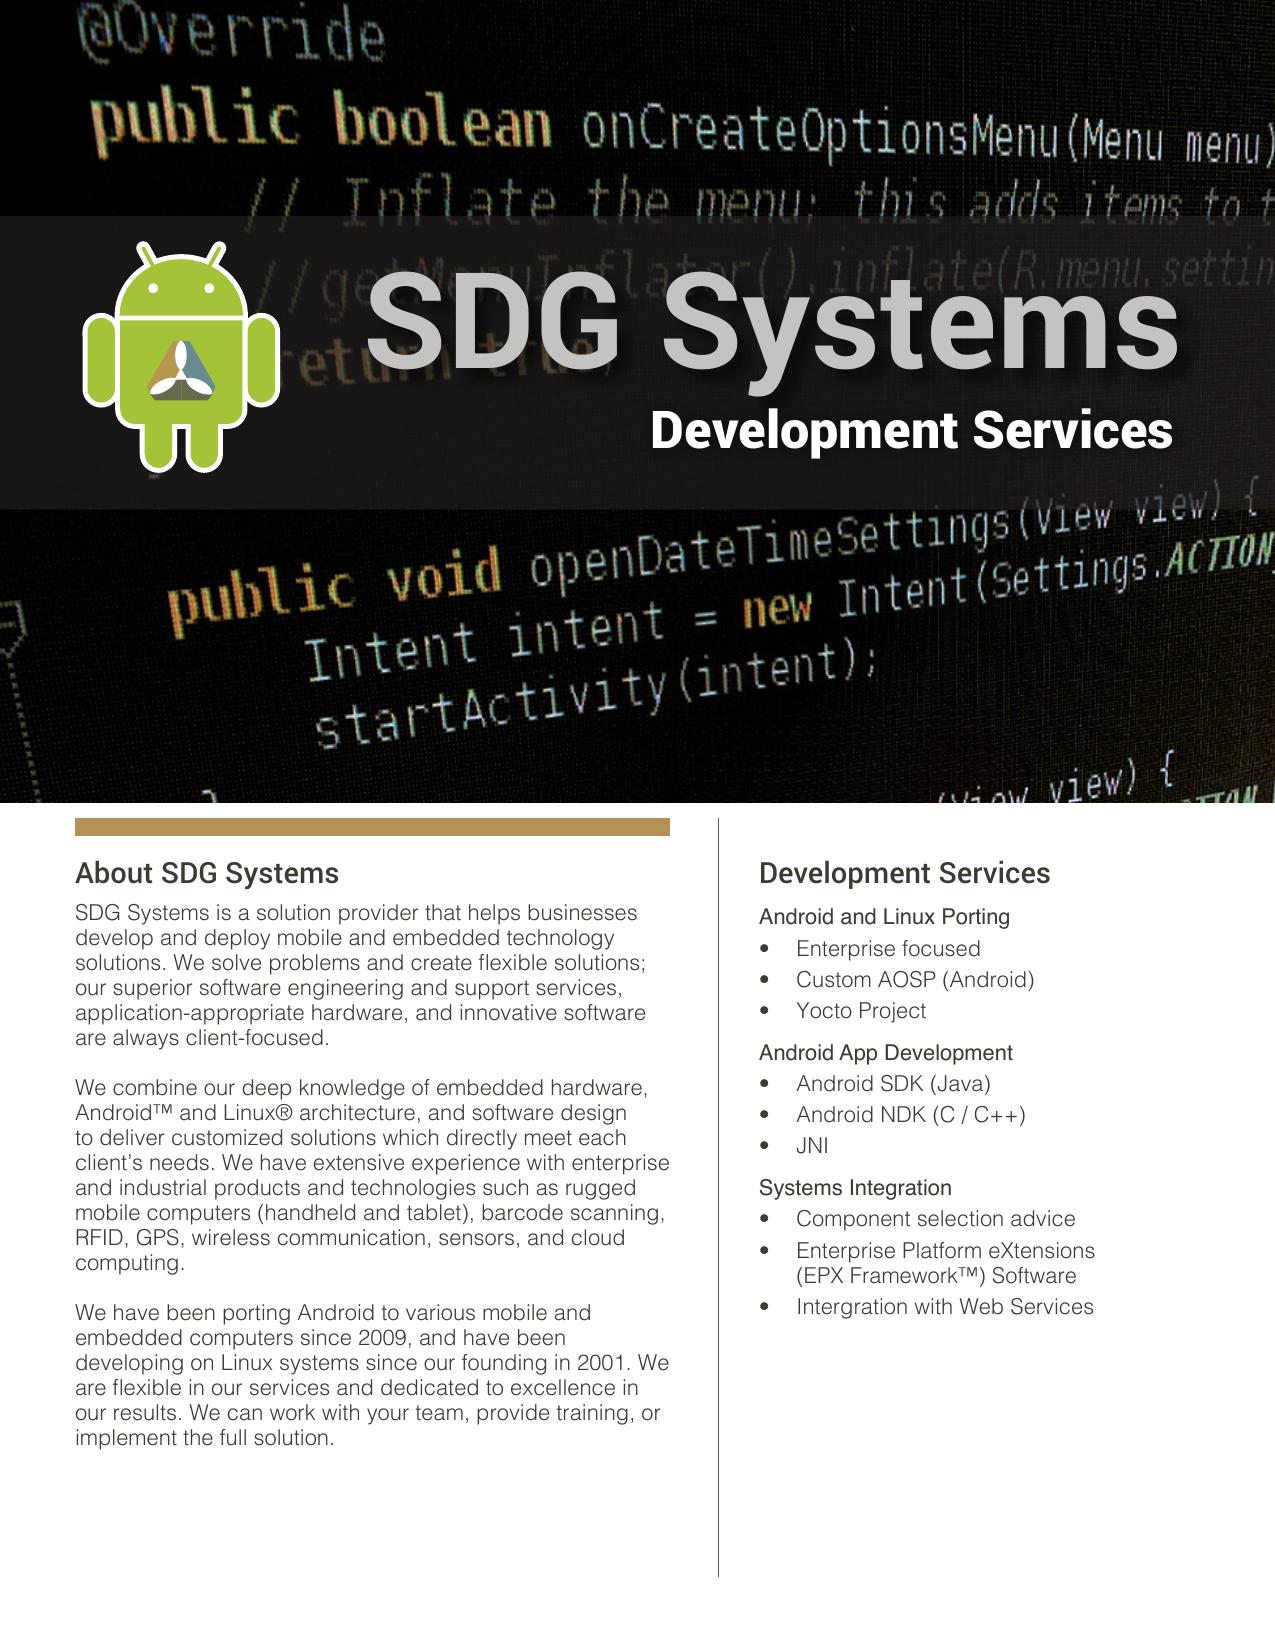 SDG_Development_Services_1 2 SDG Development Services 1 2